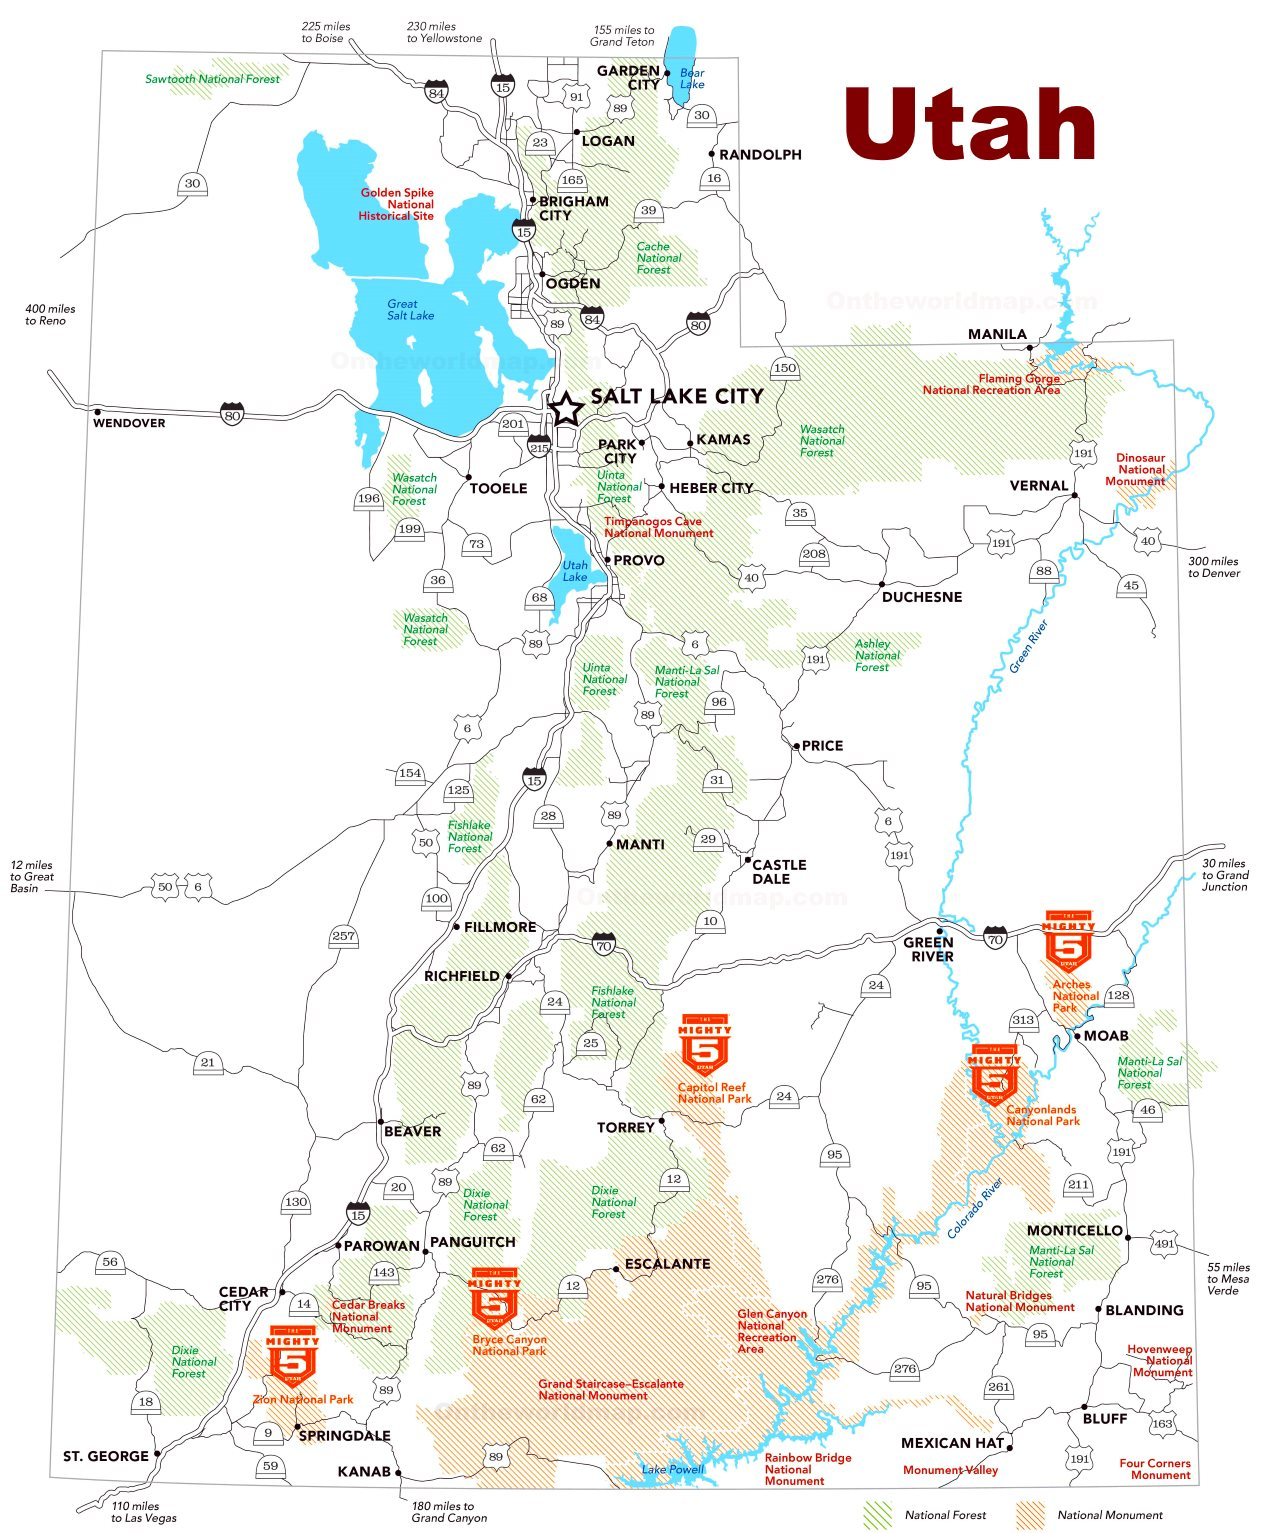 Utah tourist attractions map